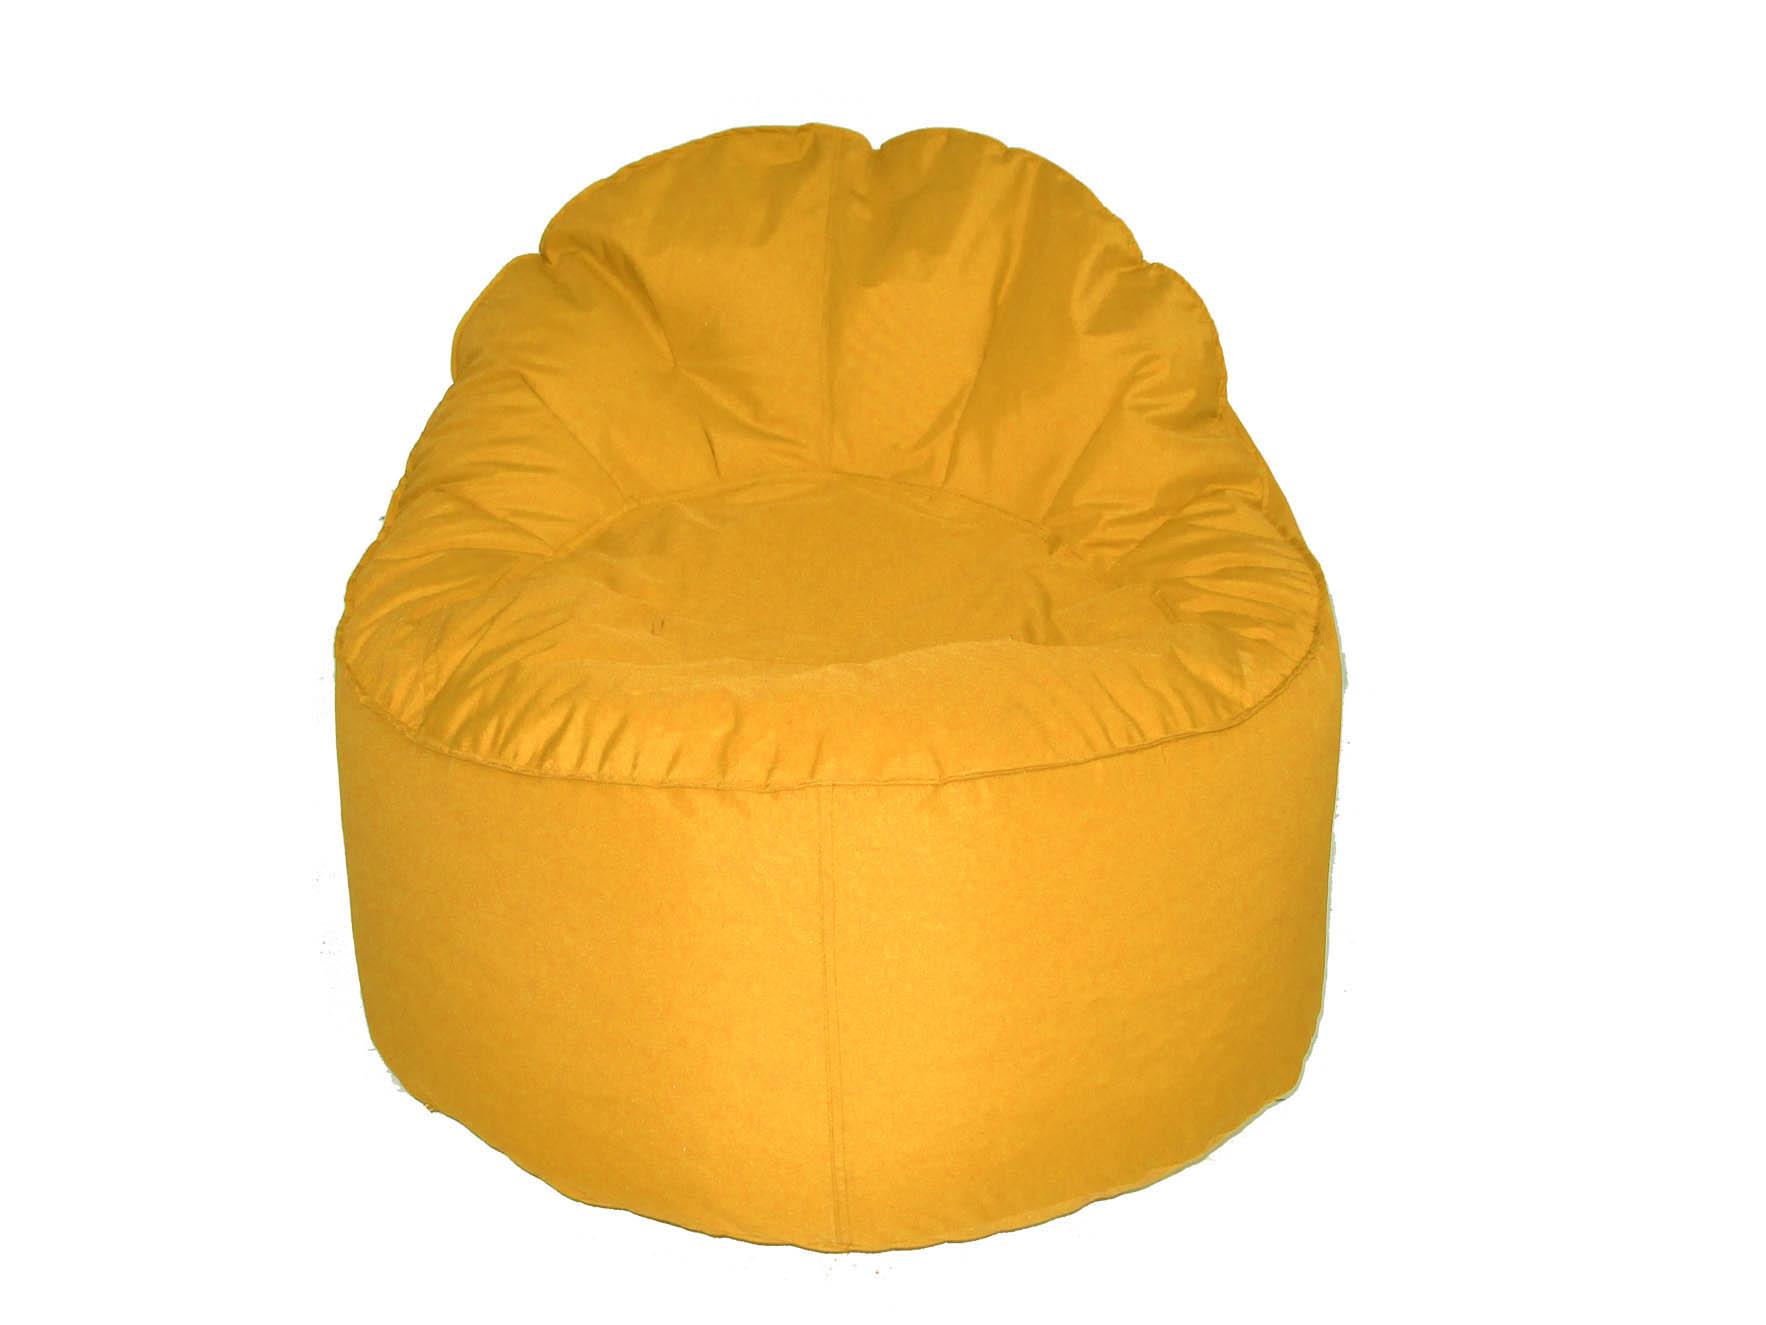 pouf fun jaune aubergine camel noir bleu orange vert violet homemaison. Black Bedroom Furniture Sets. Home Design Ideas